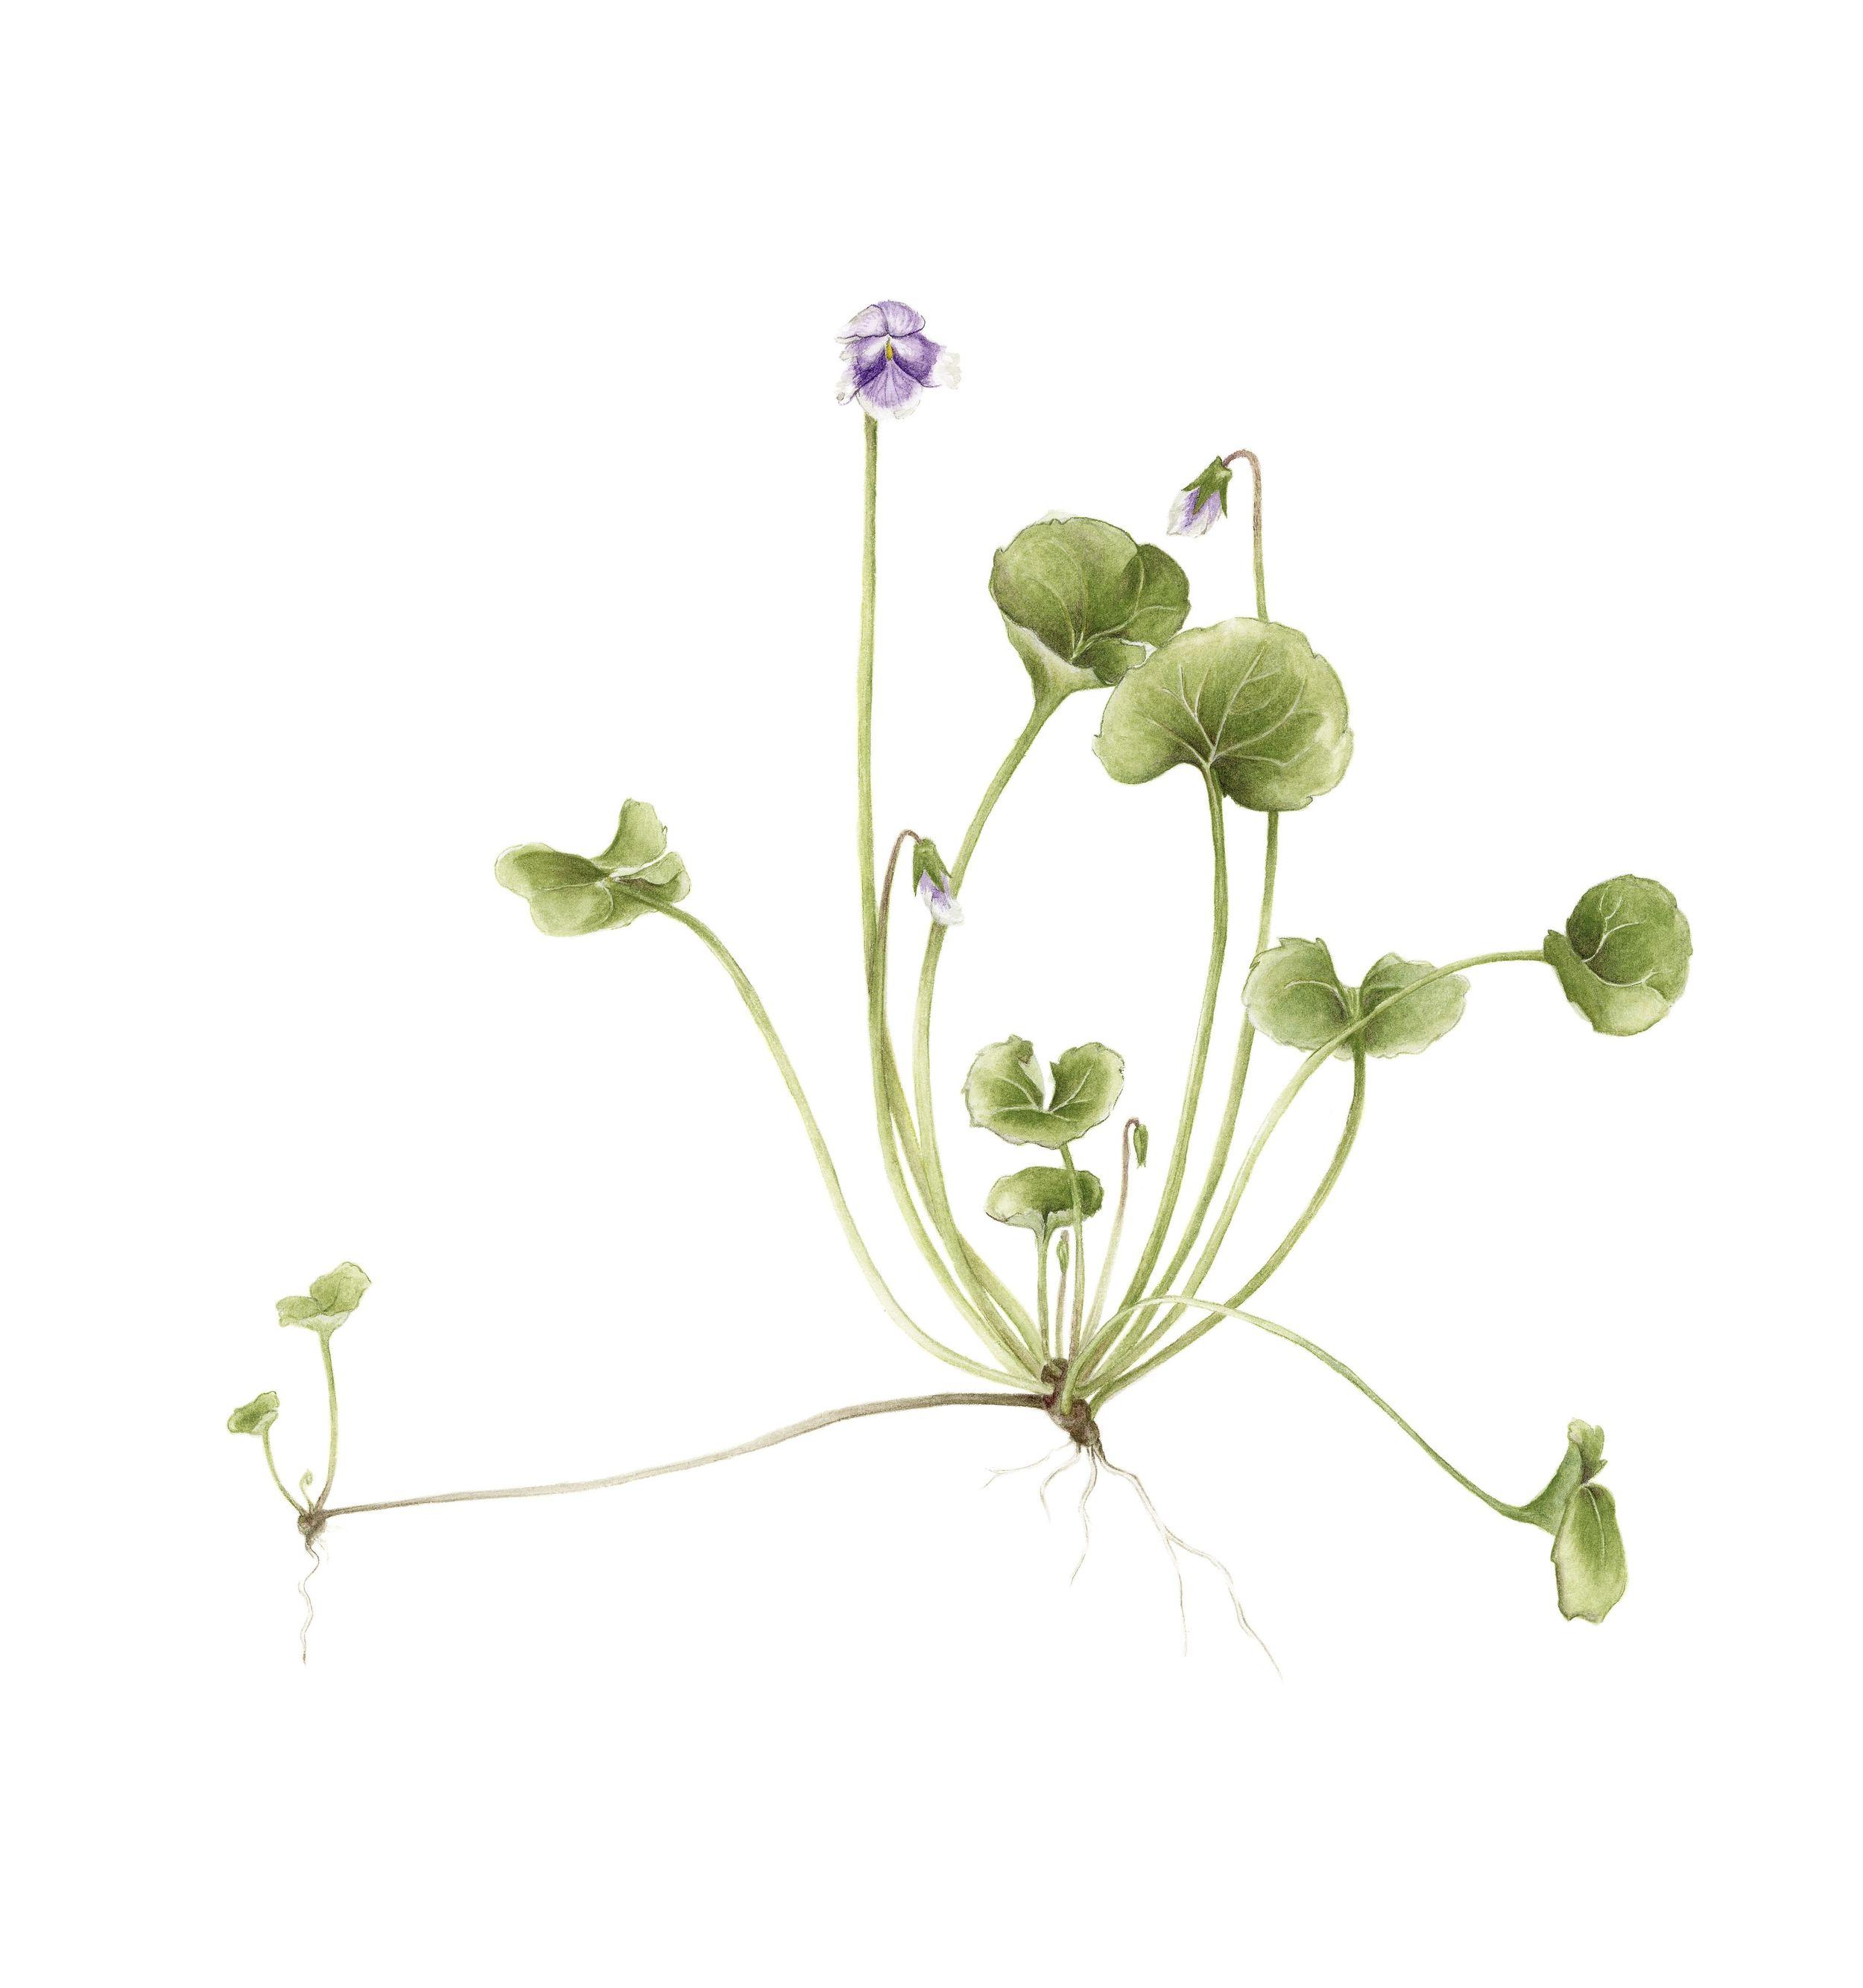 Native violet plant